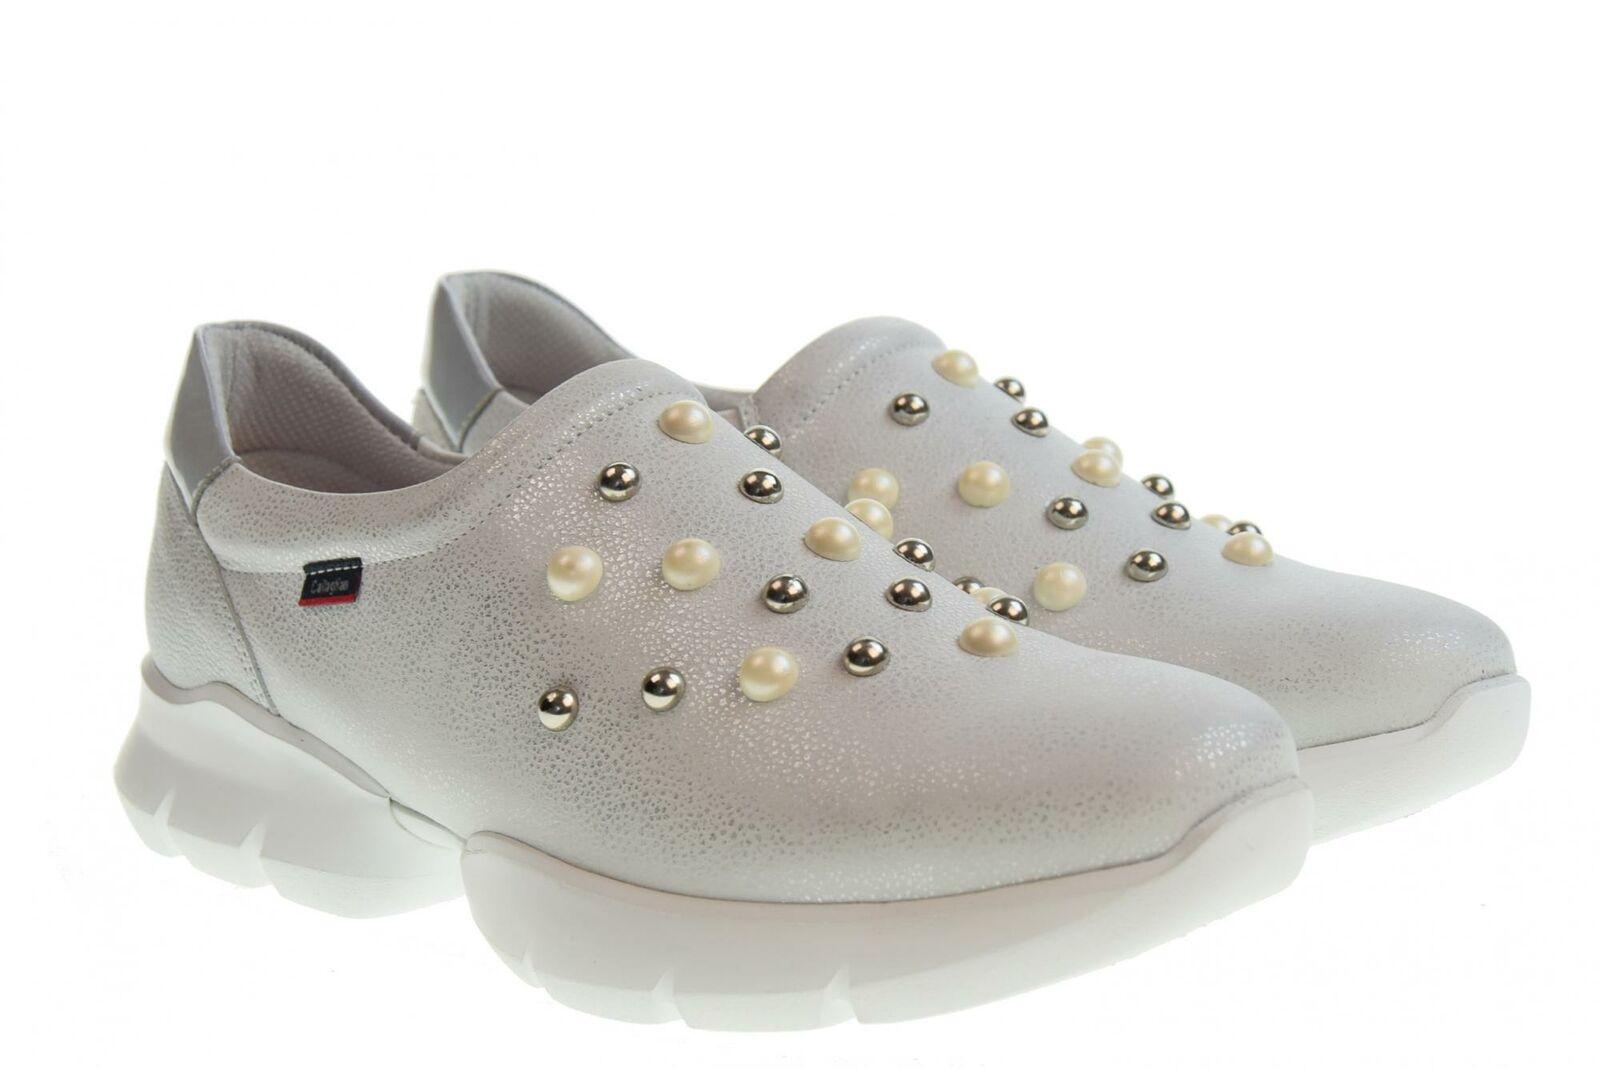 Callaghan p19g Mocassins Pour Femmes Chaussures 18701 Argento/Grigio